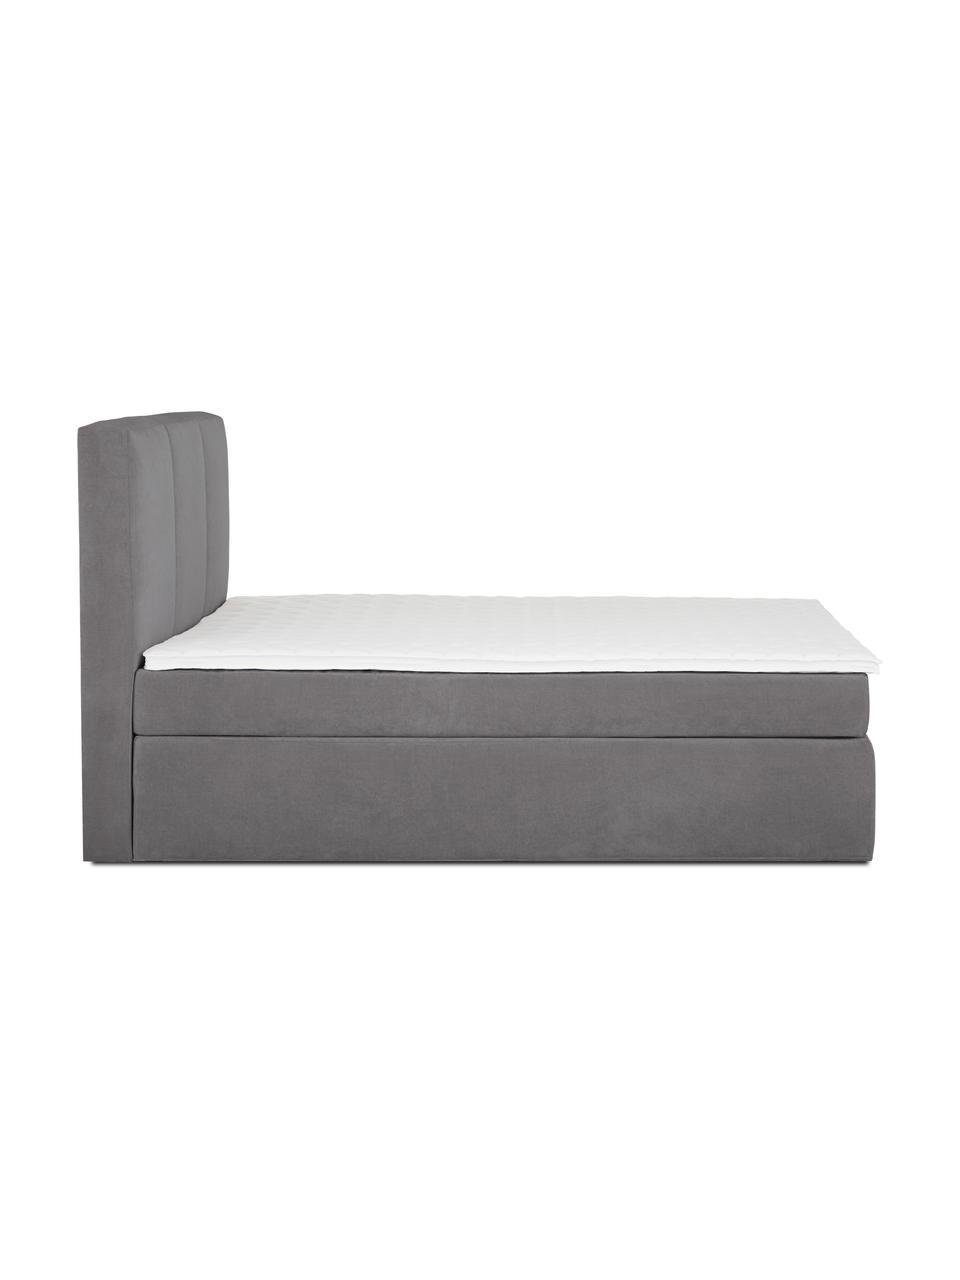 Boxspring bed Oberon in antraciet, Matras: 5-zones pocketvering, Poten: kunststof, Stof antraciet, 200 x 200 cm